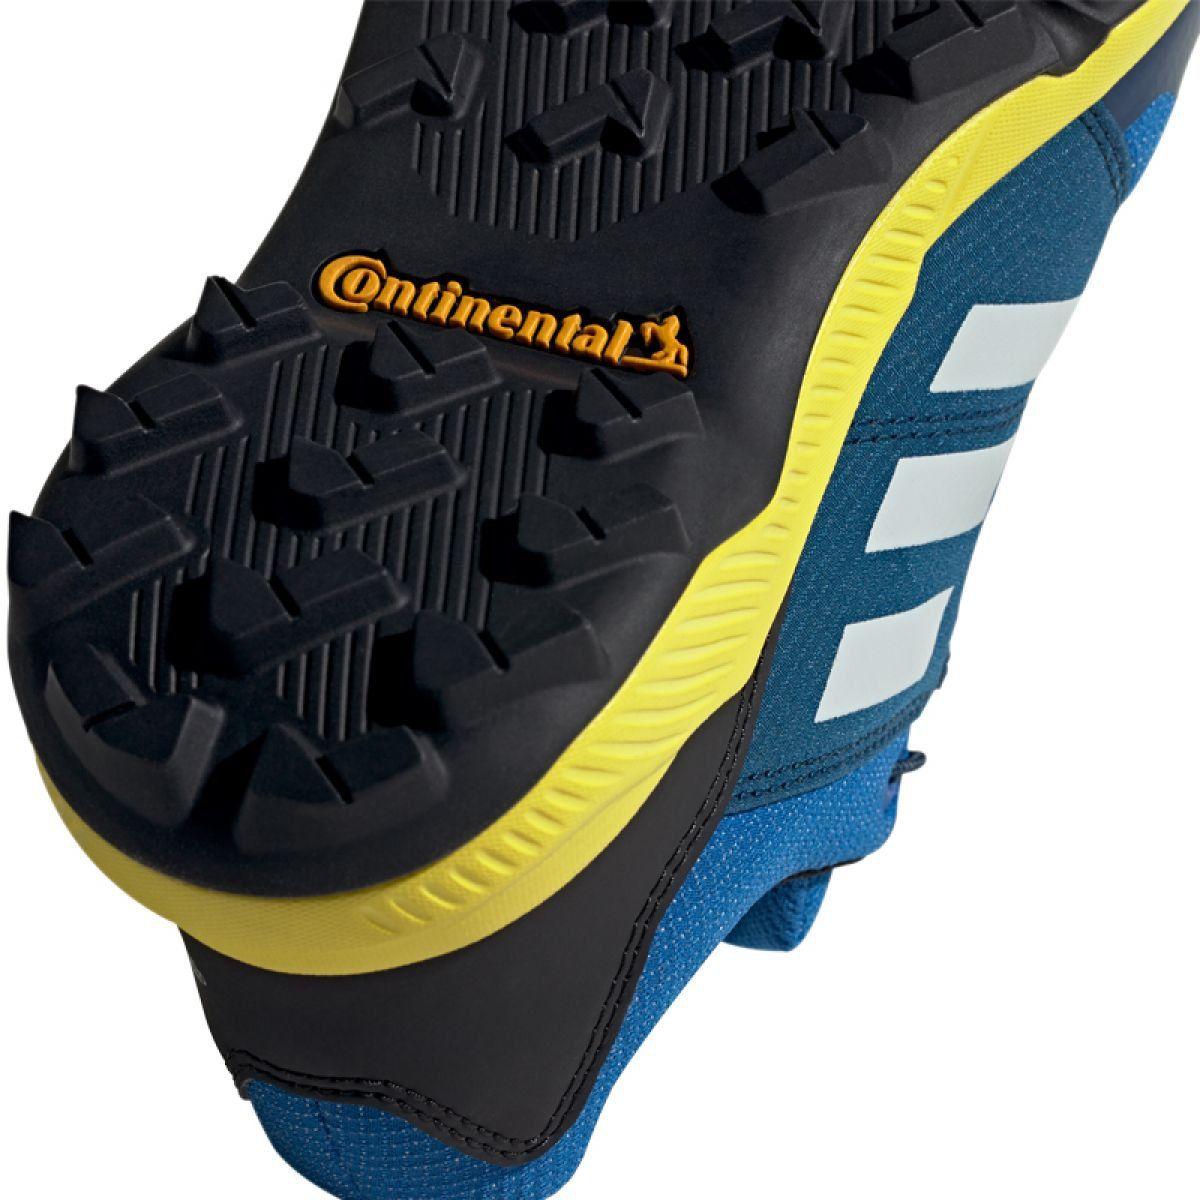 Buty Adidas Terrex Gtx Jr Bc0599 Niebieskie Junior Shoes Blue Shoes Durable Shoes